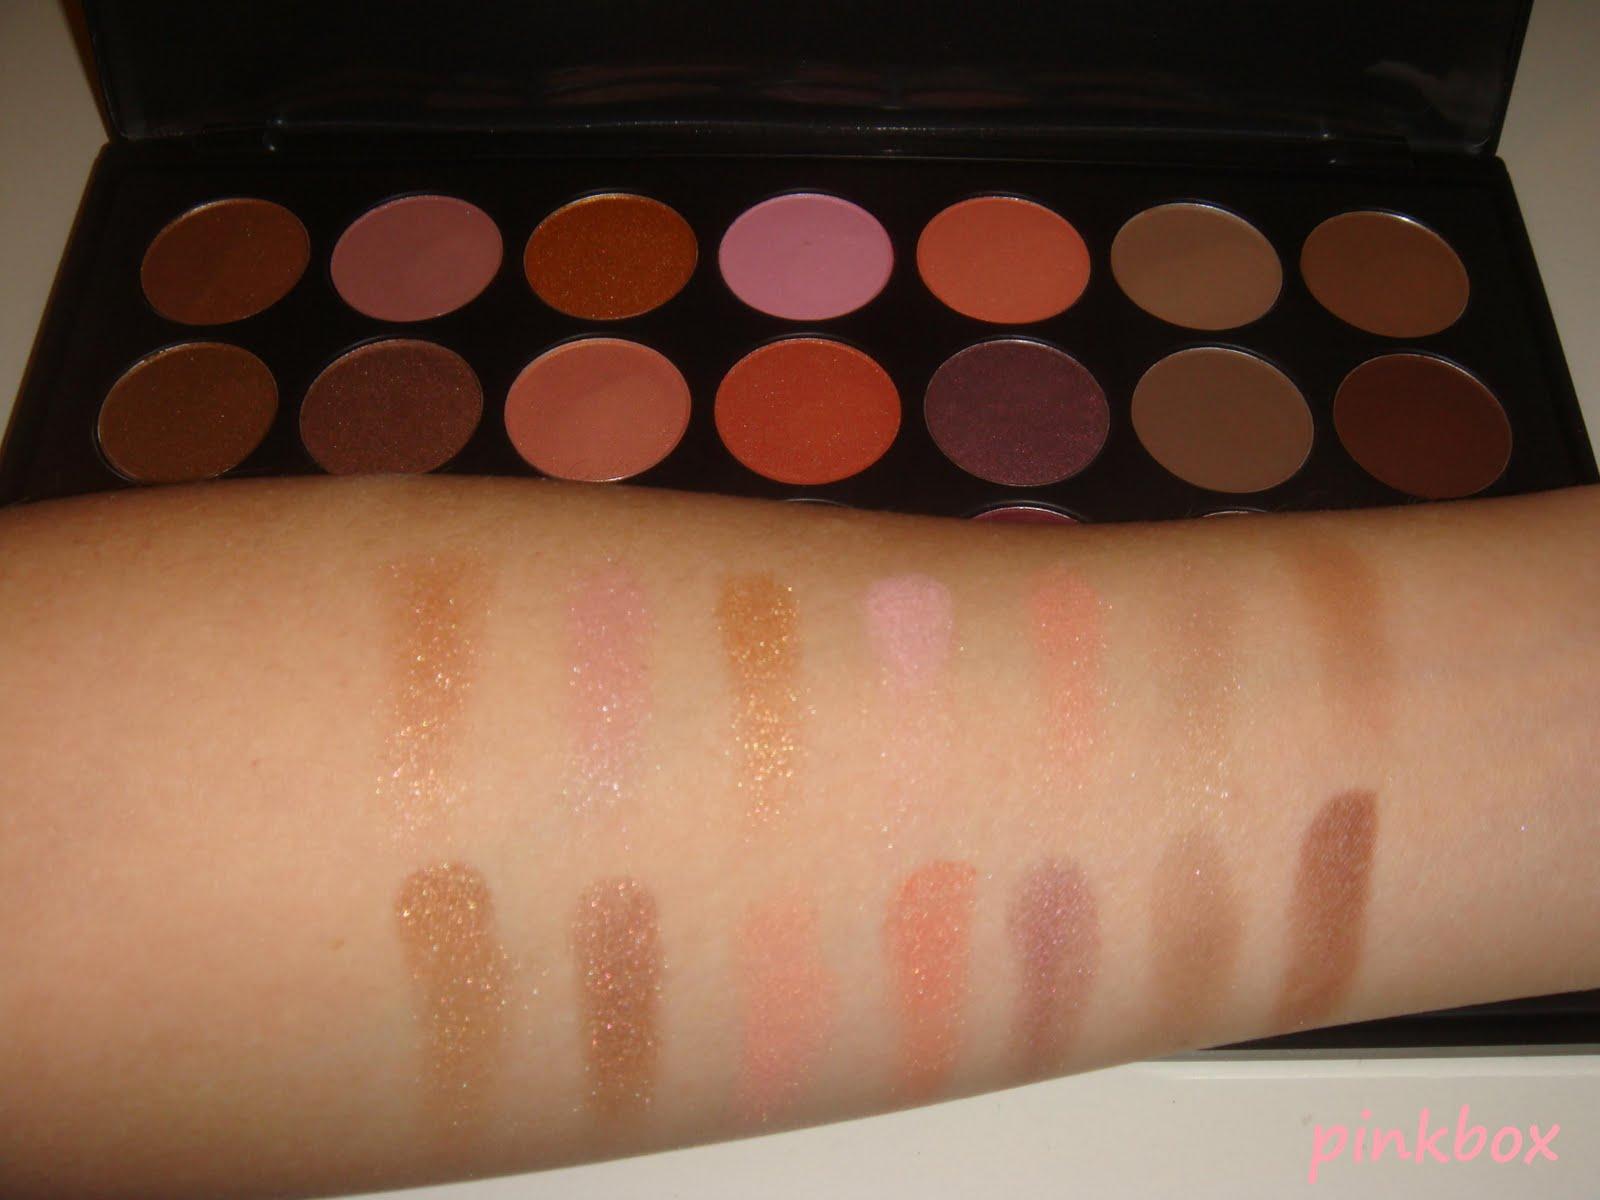 Dark Rose Eyeshadow And Blush Palette by BH Cosmetics #12